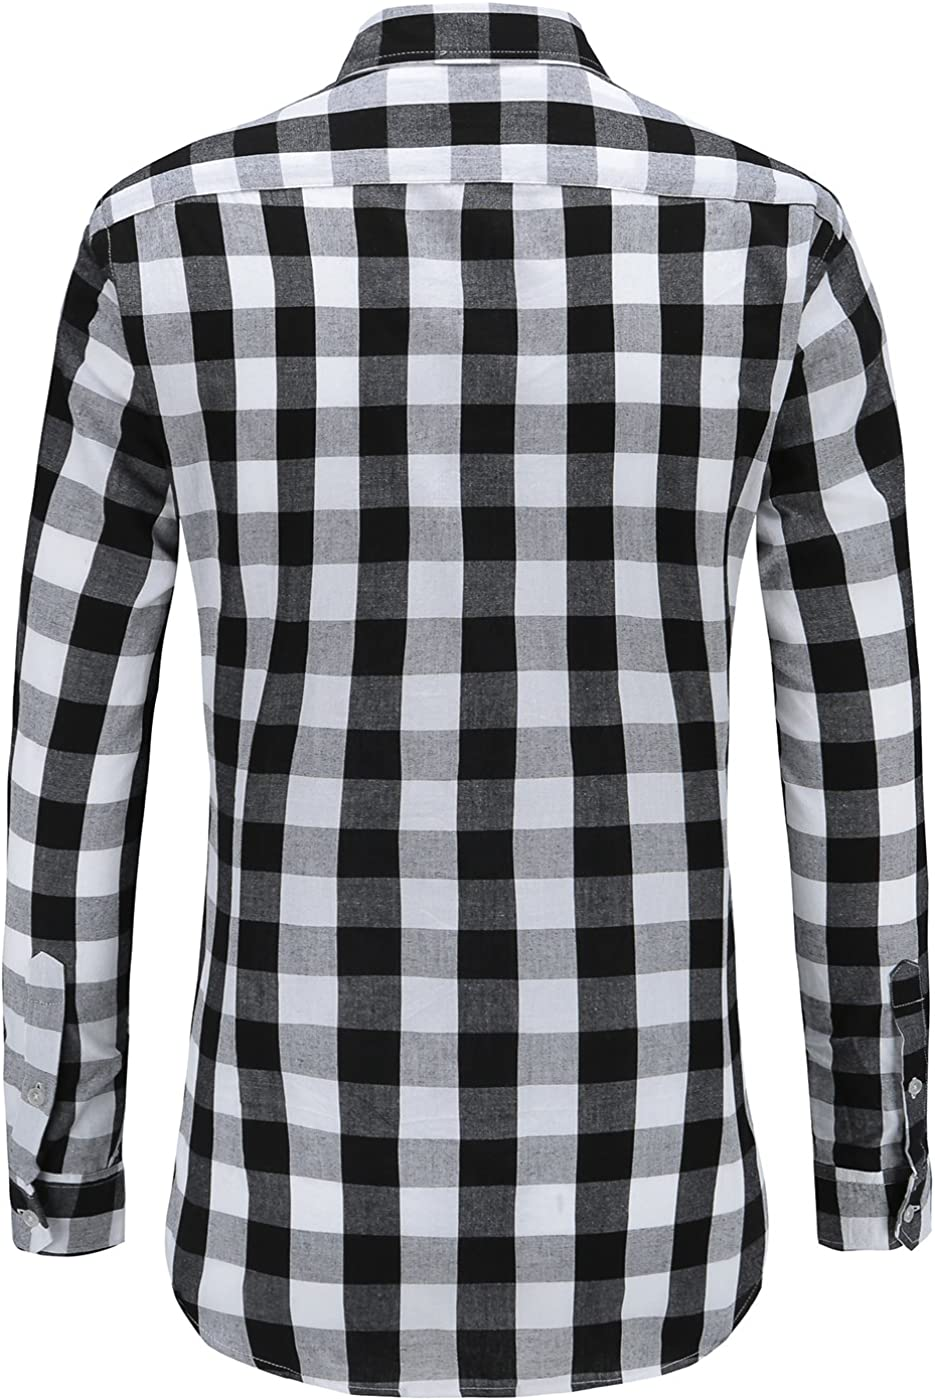 NEW Deb White Long Sleeve Button Down Blouse D1-25